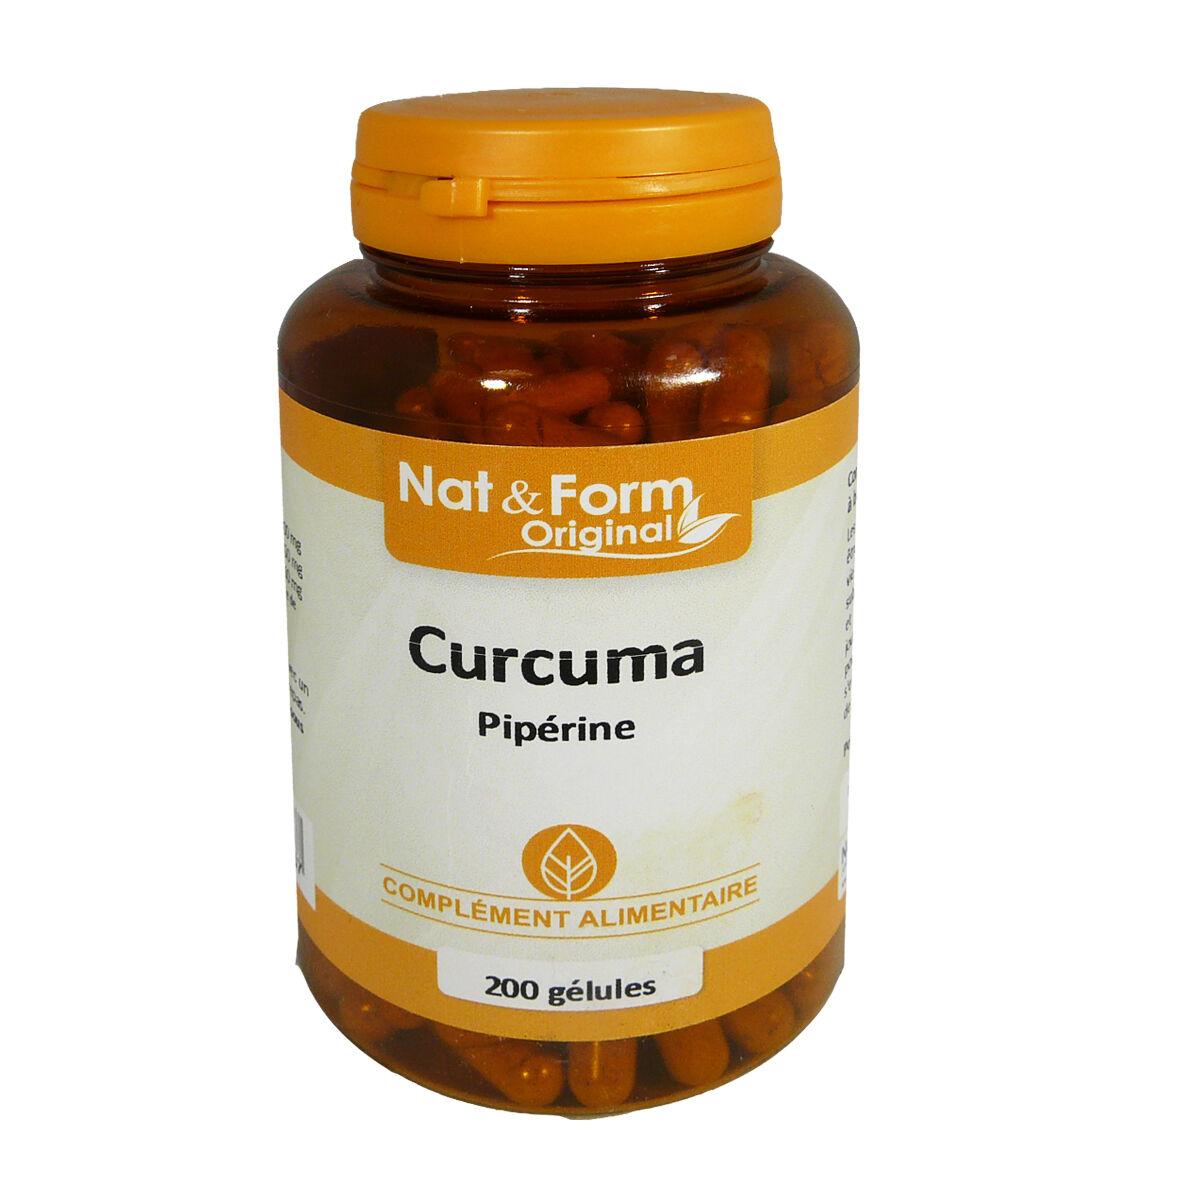 Nat & form curcuma piperine 200 gelules